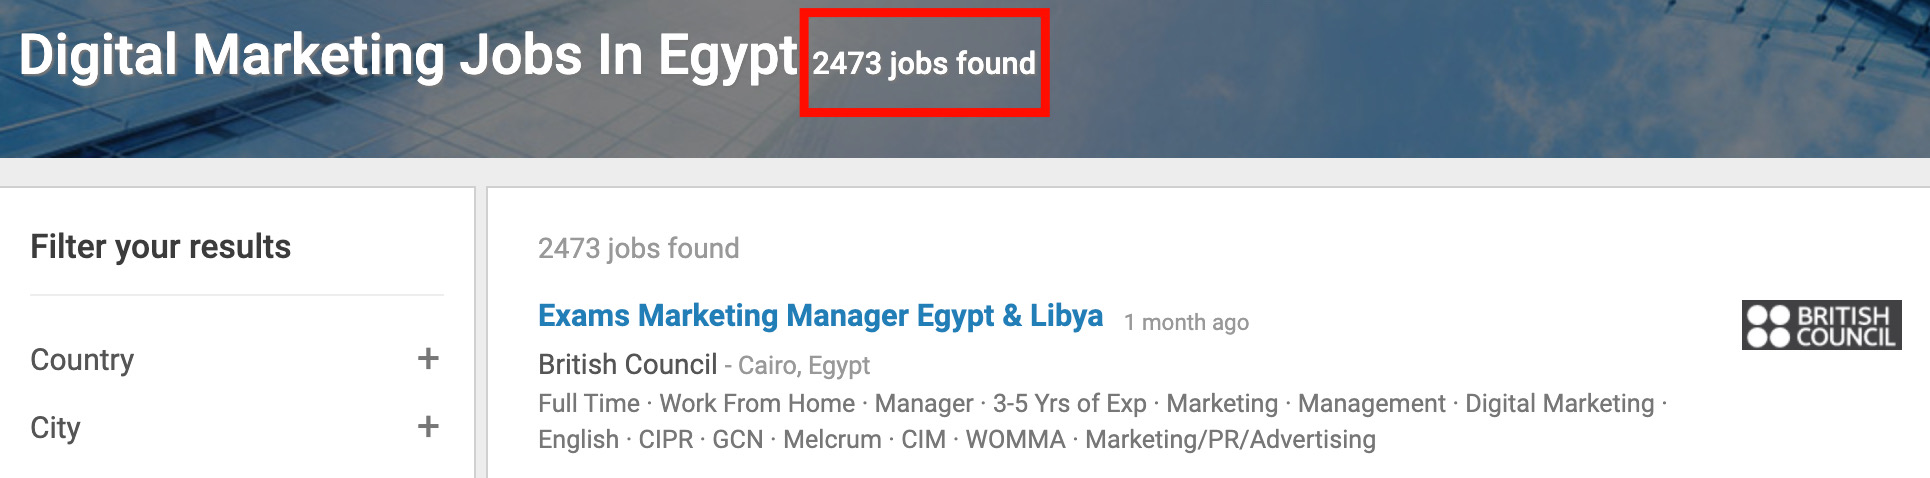 Digital Marketing Jobs in Egypt